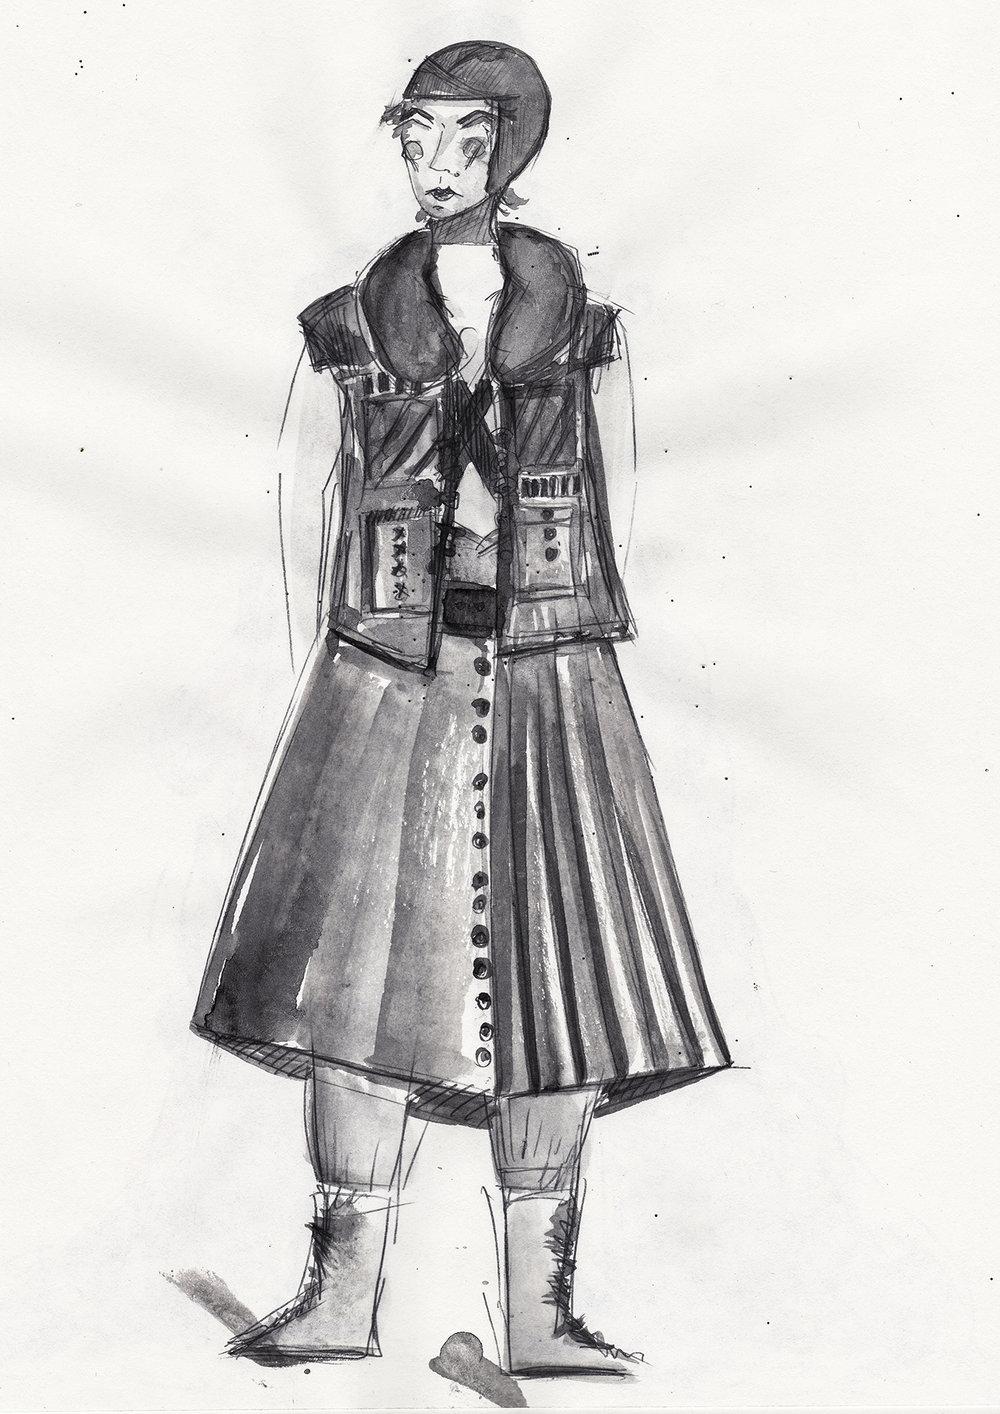 Macbeth /2/ and /7/ - Costume design